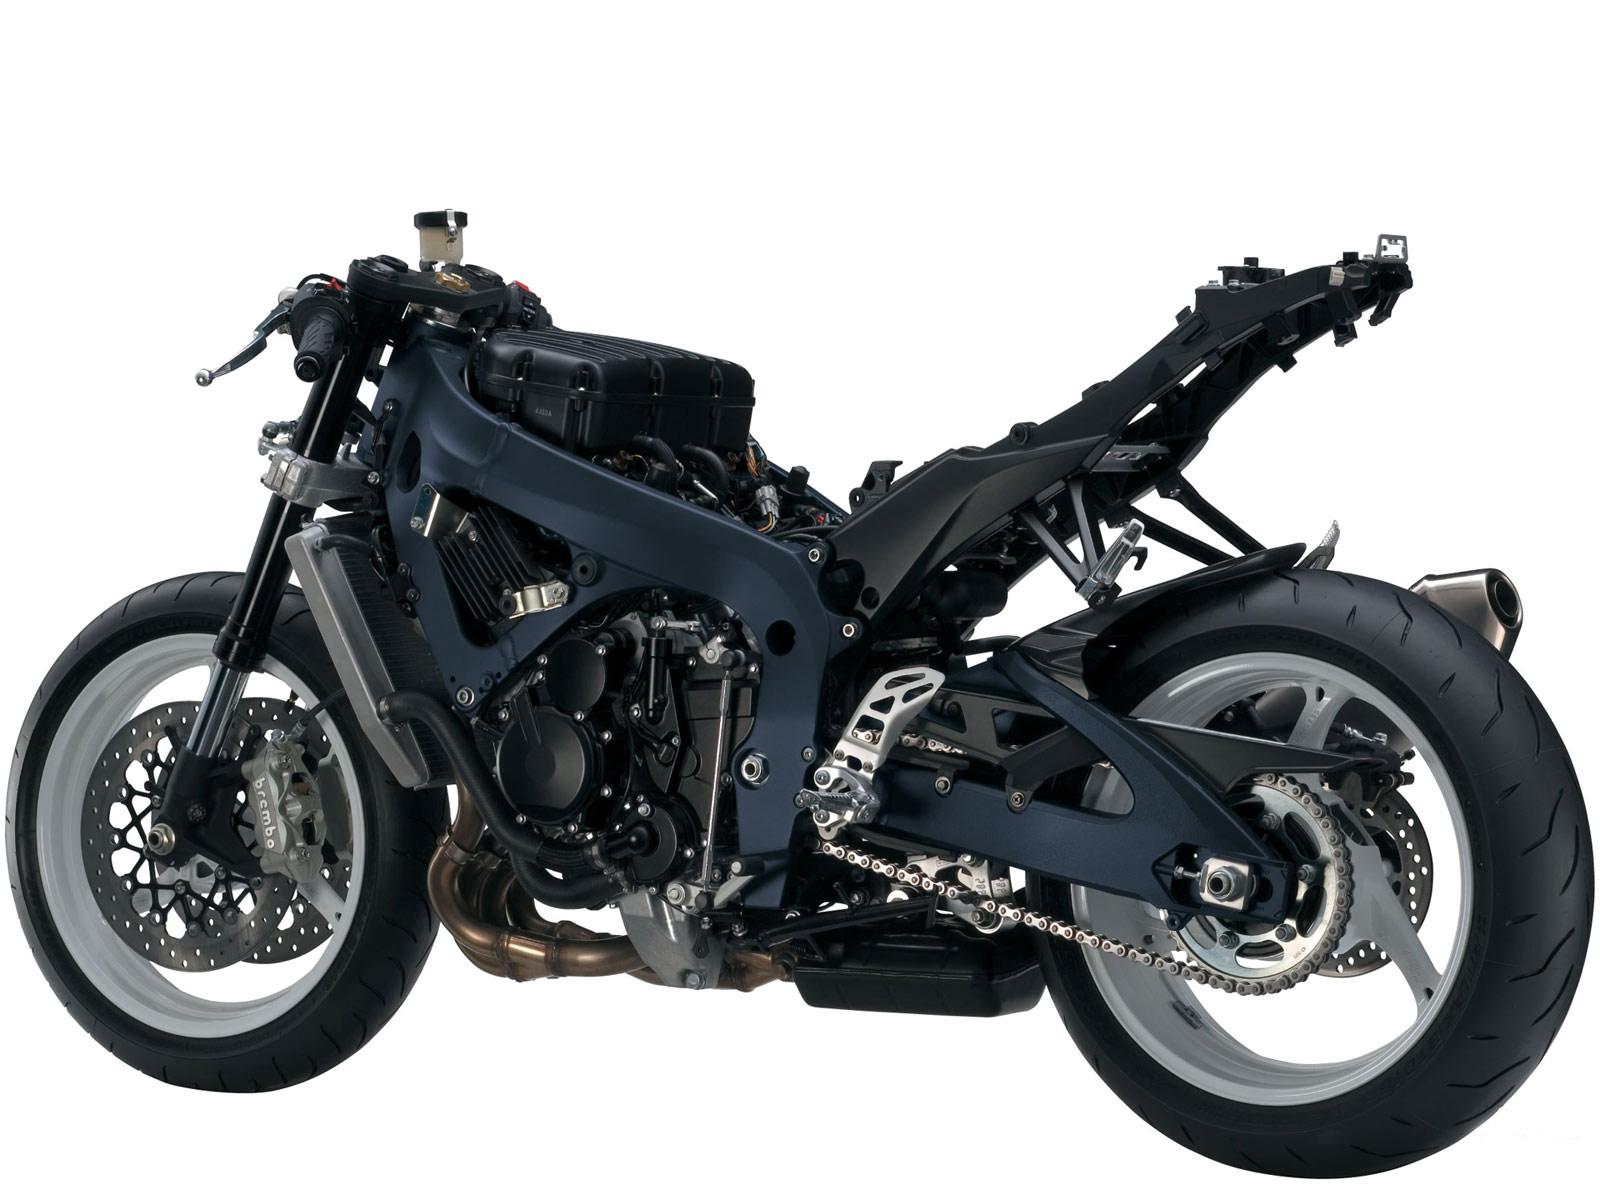 http://1.bp.blogspot.com/-I8UvdARgsfc/TuVStX3C-SI/AAAAAAAAFQw/IFvqE1R-GyQ/s1600/2011_Suzuki_GSX-R_600_motorcycle-desktop-wallpaper_14.jpg